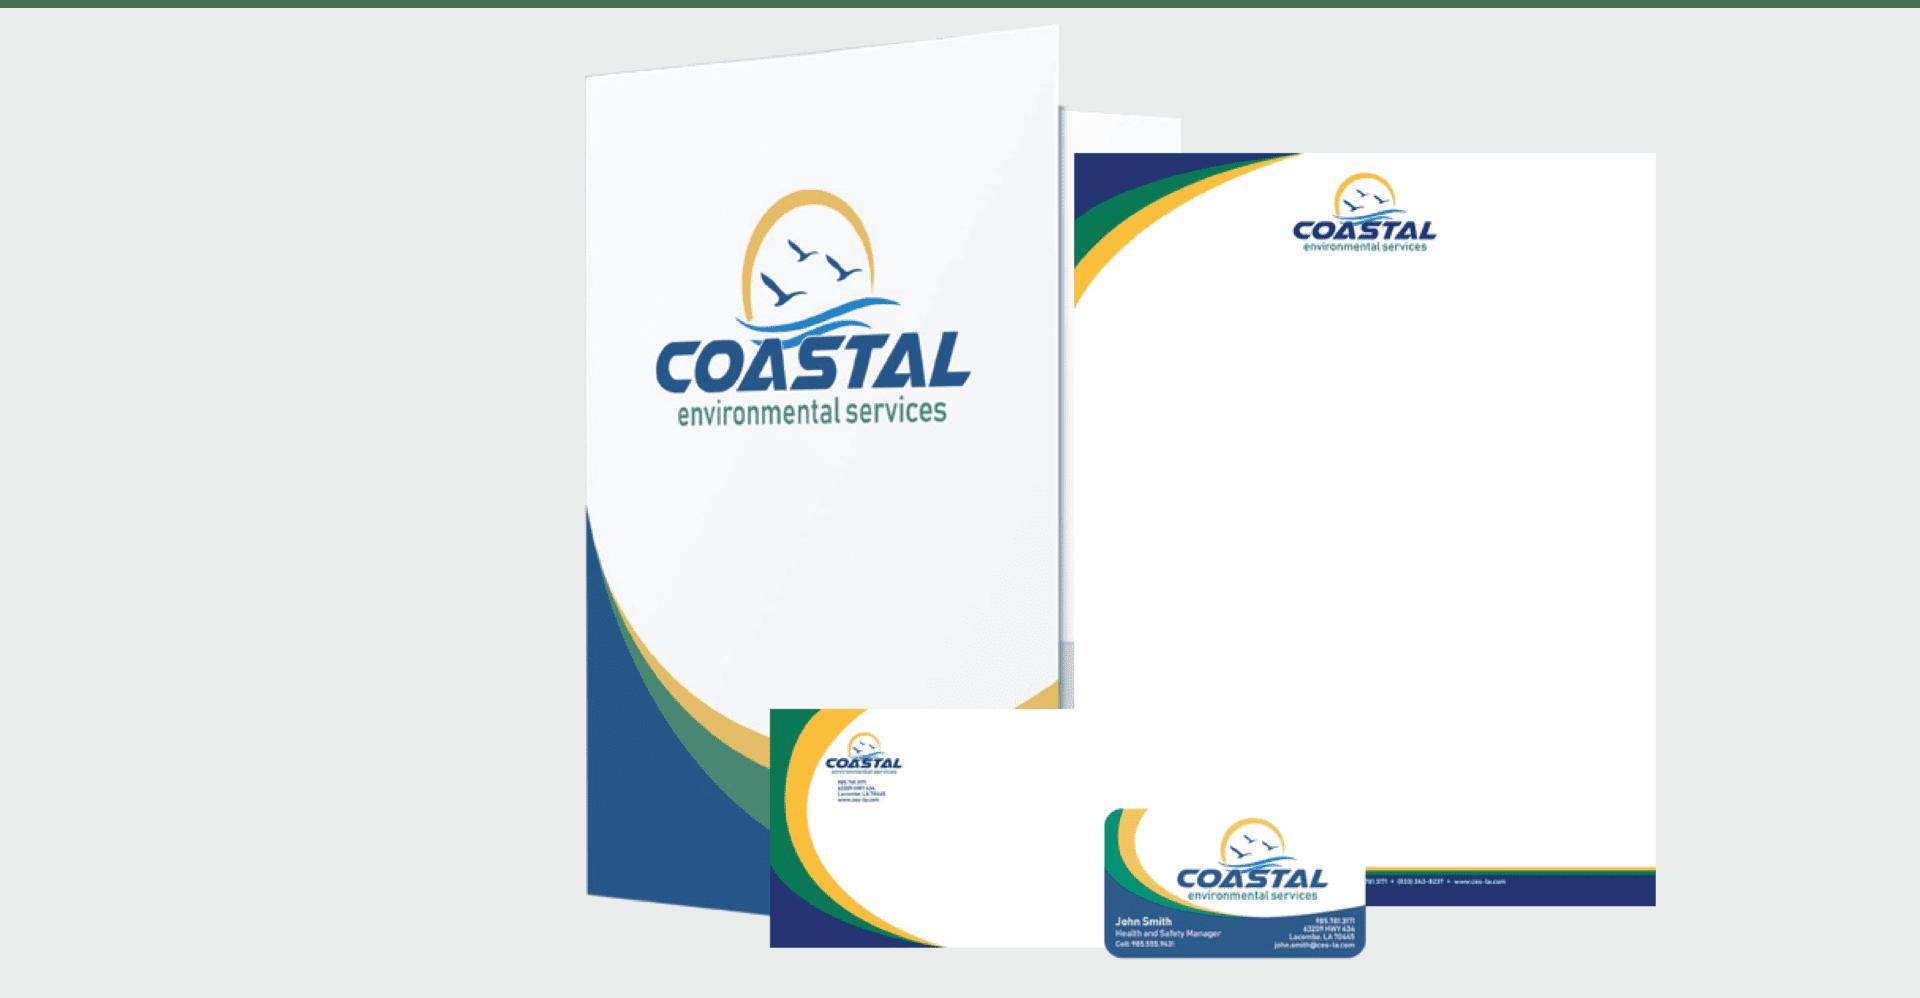 Coastal Environmental Services Example Signs